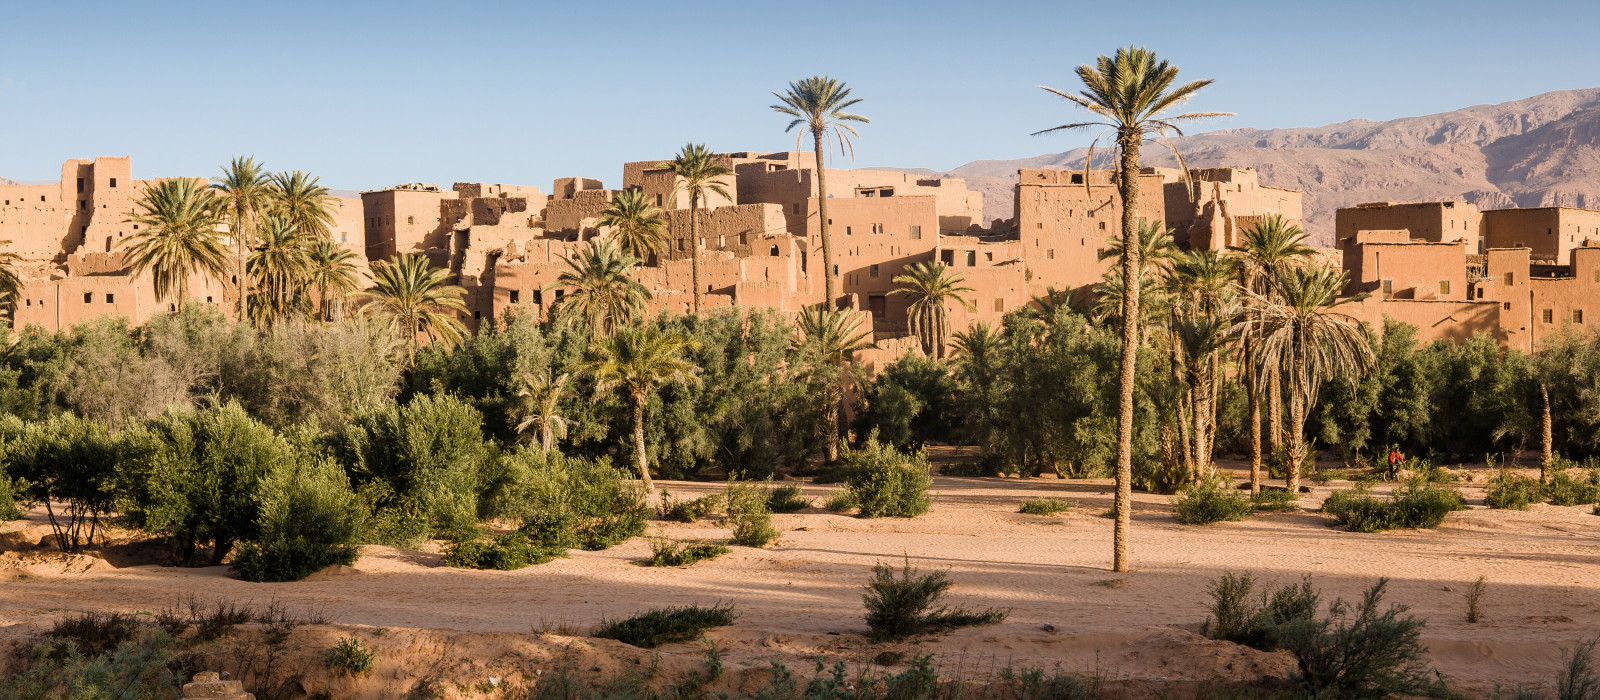 Kasbah nahe Tinerhir, Marokko